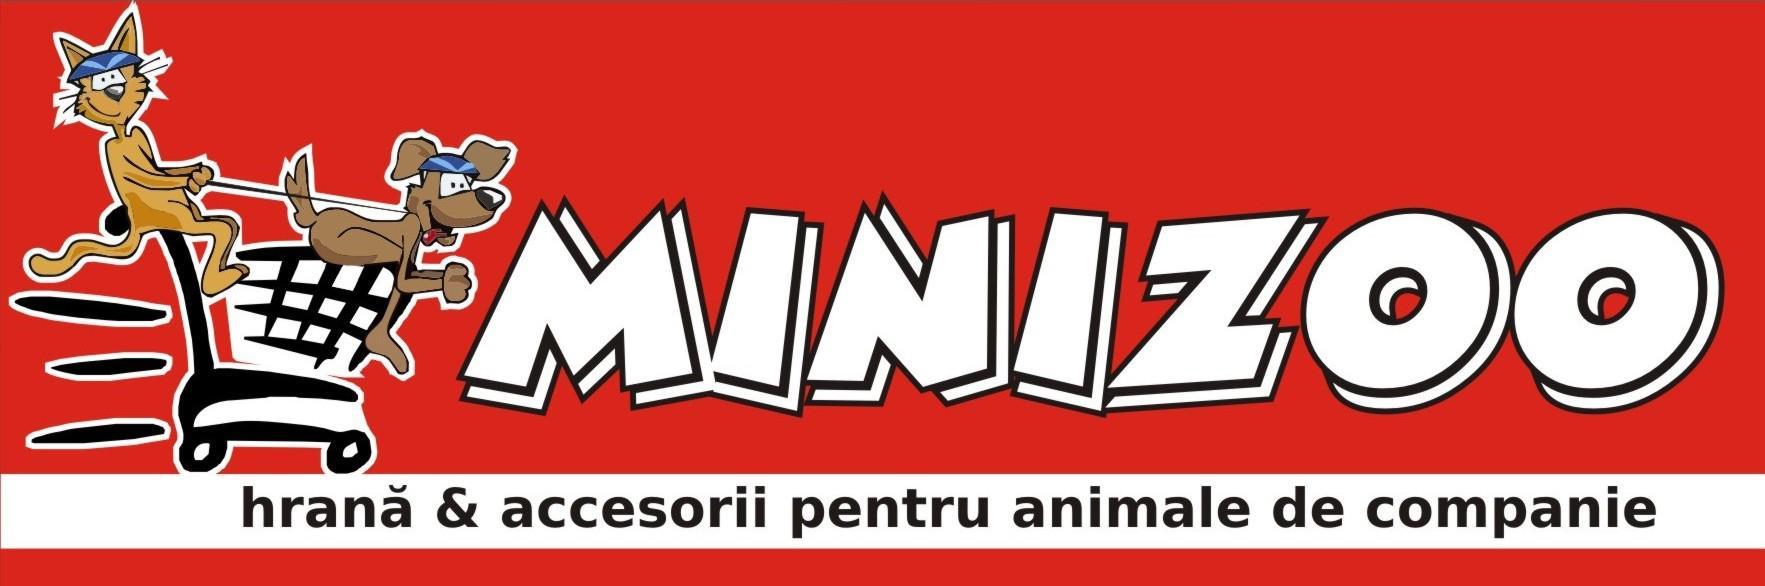 Logo Petshop Minizoo